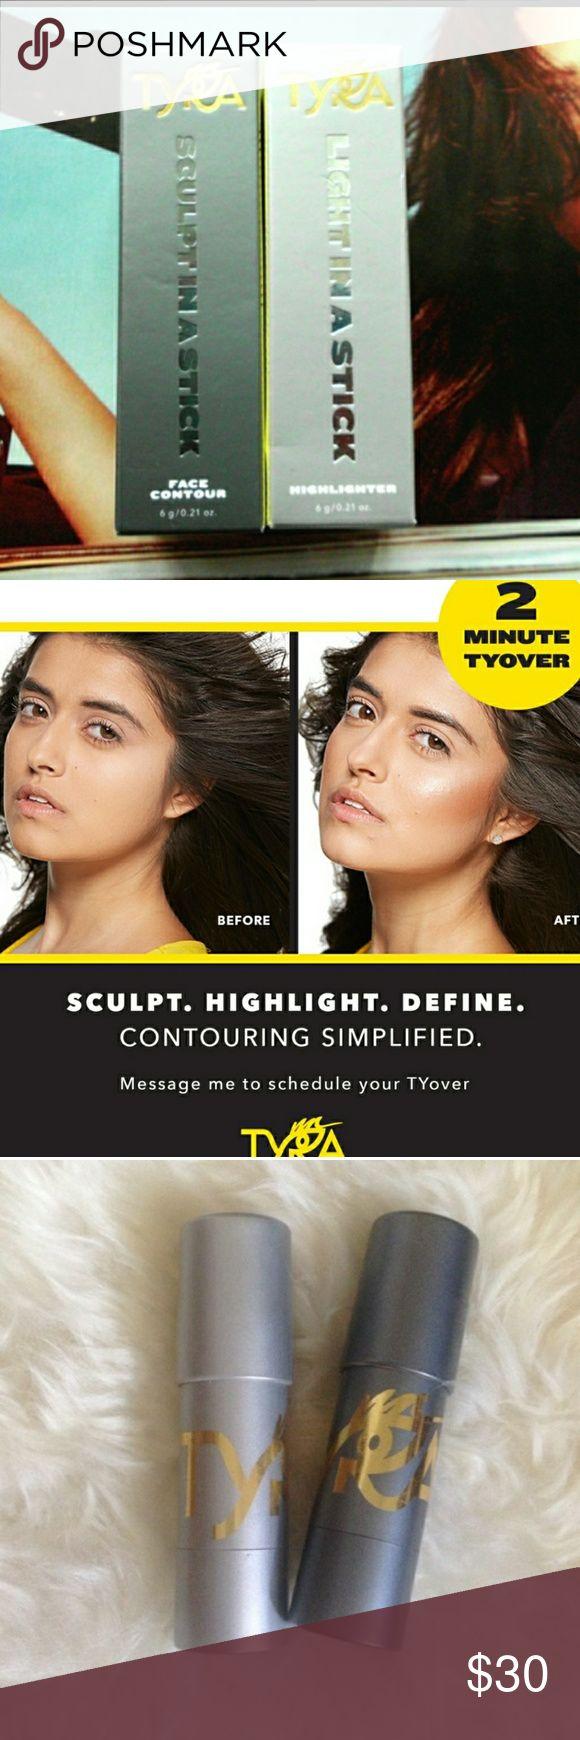 NIB Tyra Banks Makeup NEVER EVEN OPENED ITS A 2 MINUTE TYOVER MAKEUP SET. THE COLOR IS DEEP AND SINSATIONAL CITY. tyra banks Makeup